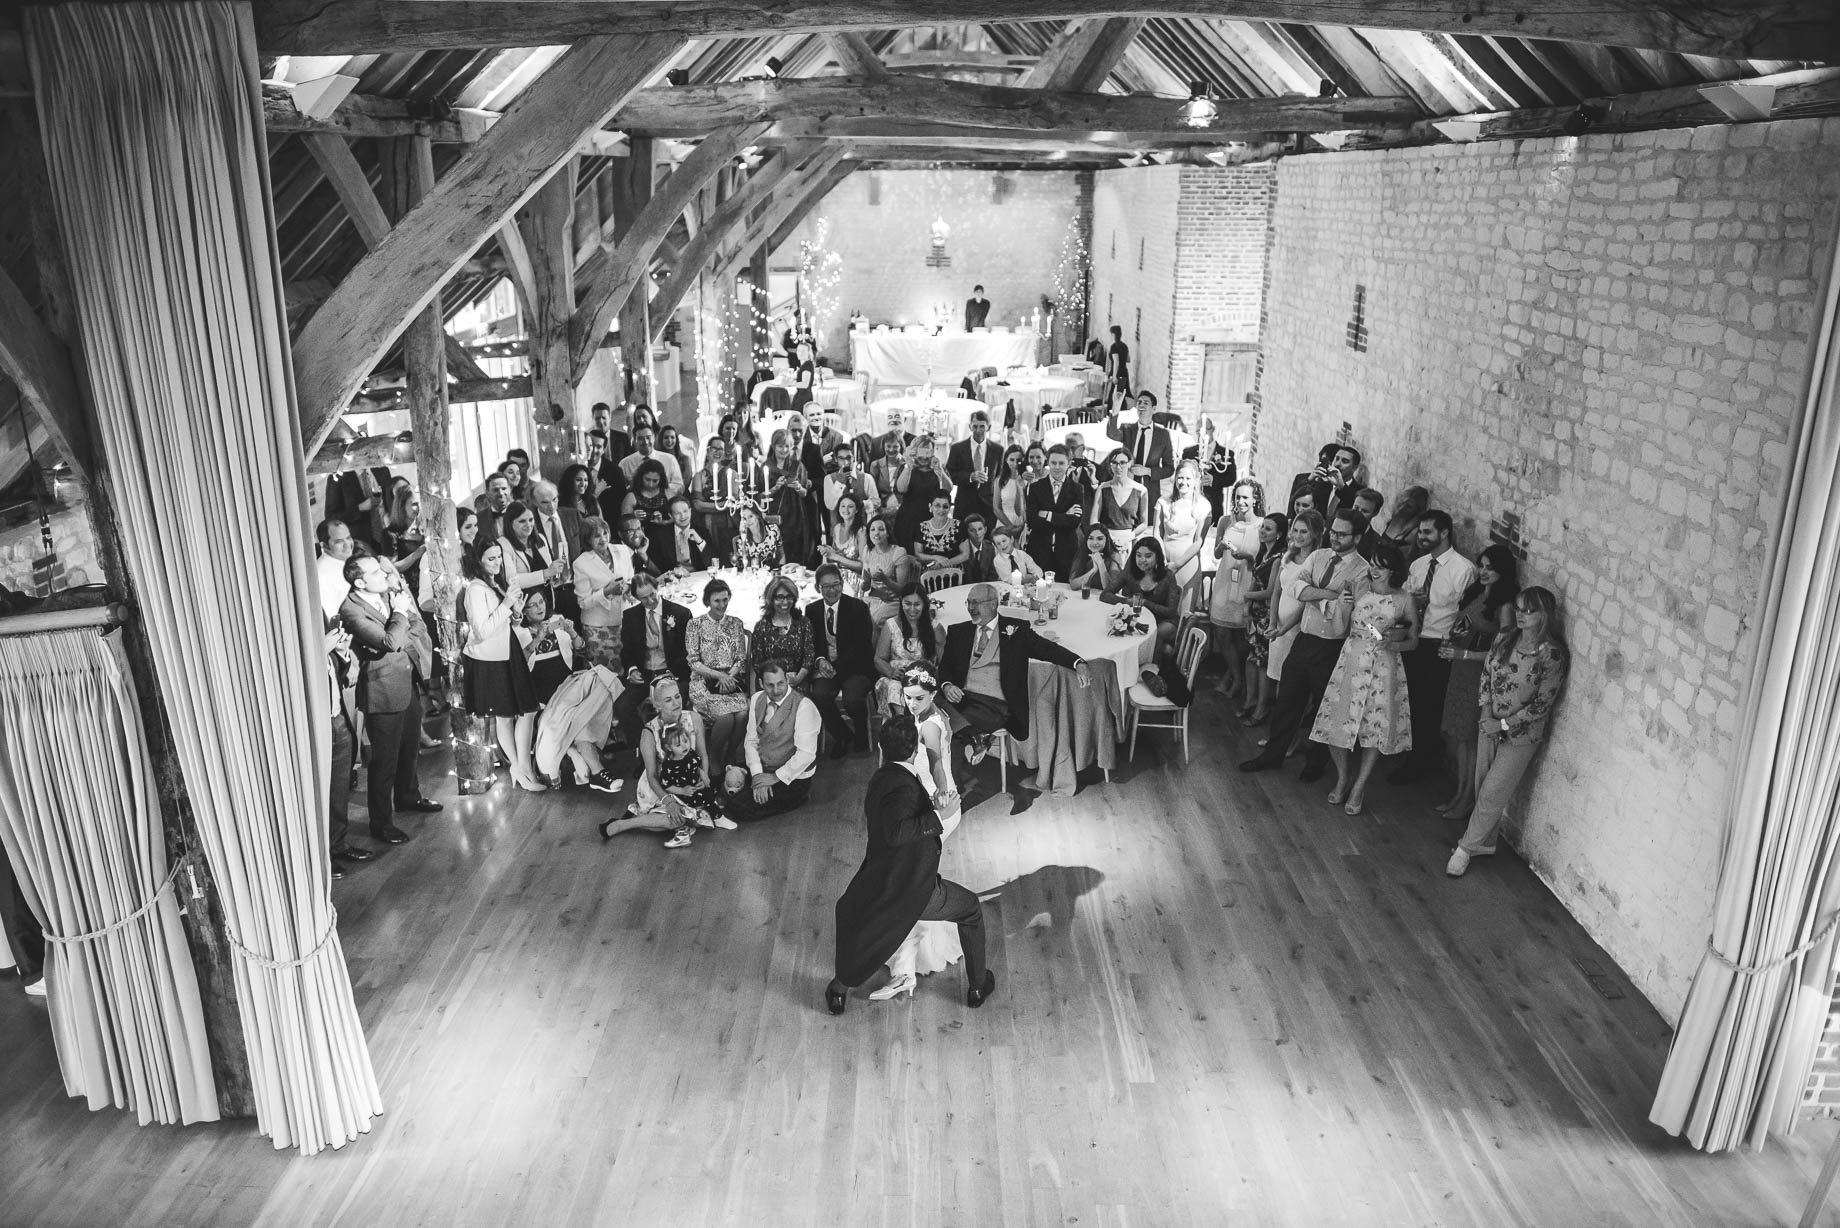 Bury Court Barn Wedding Photography - Caroline and Rob (194 of 219)